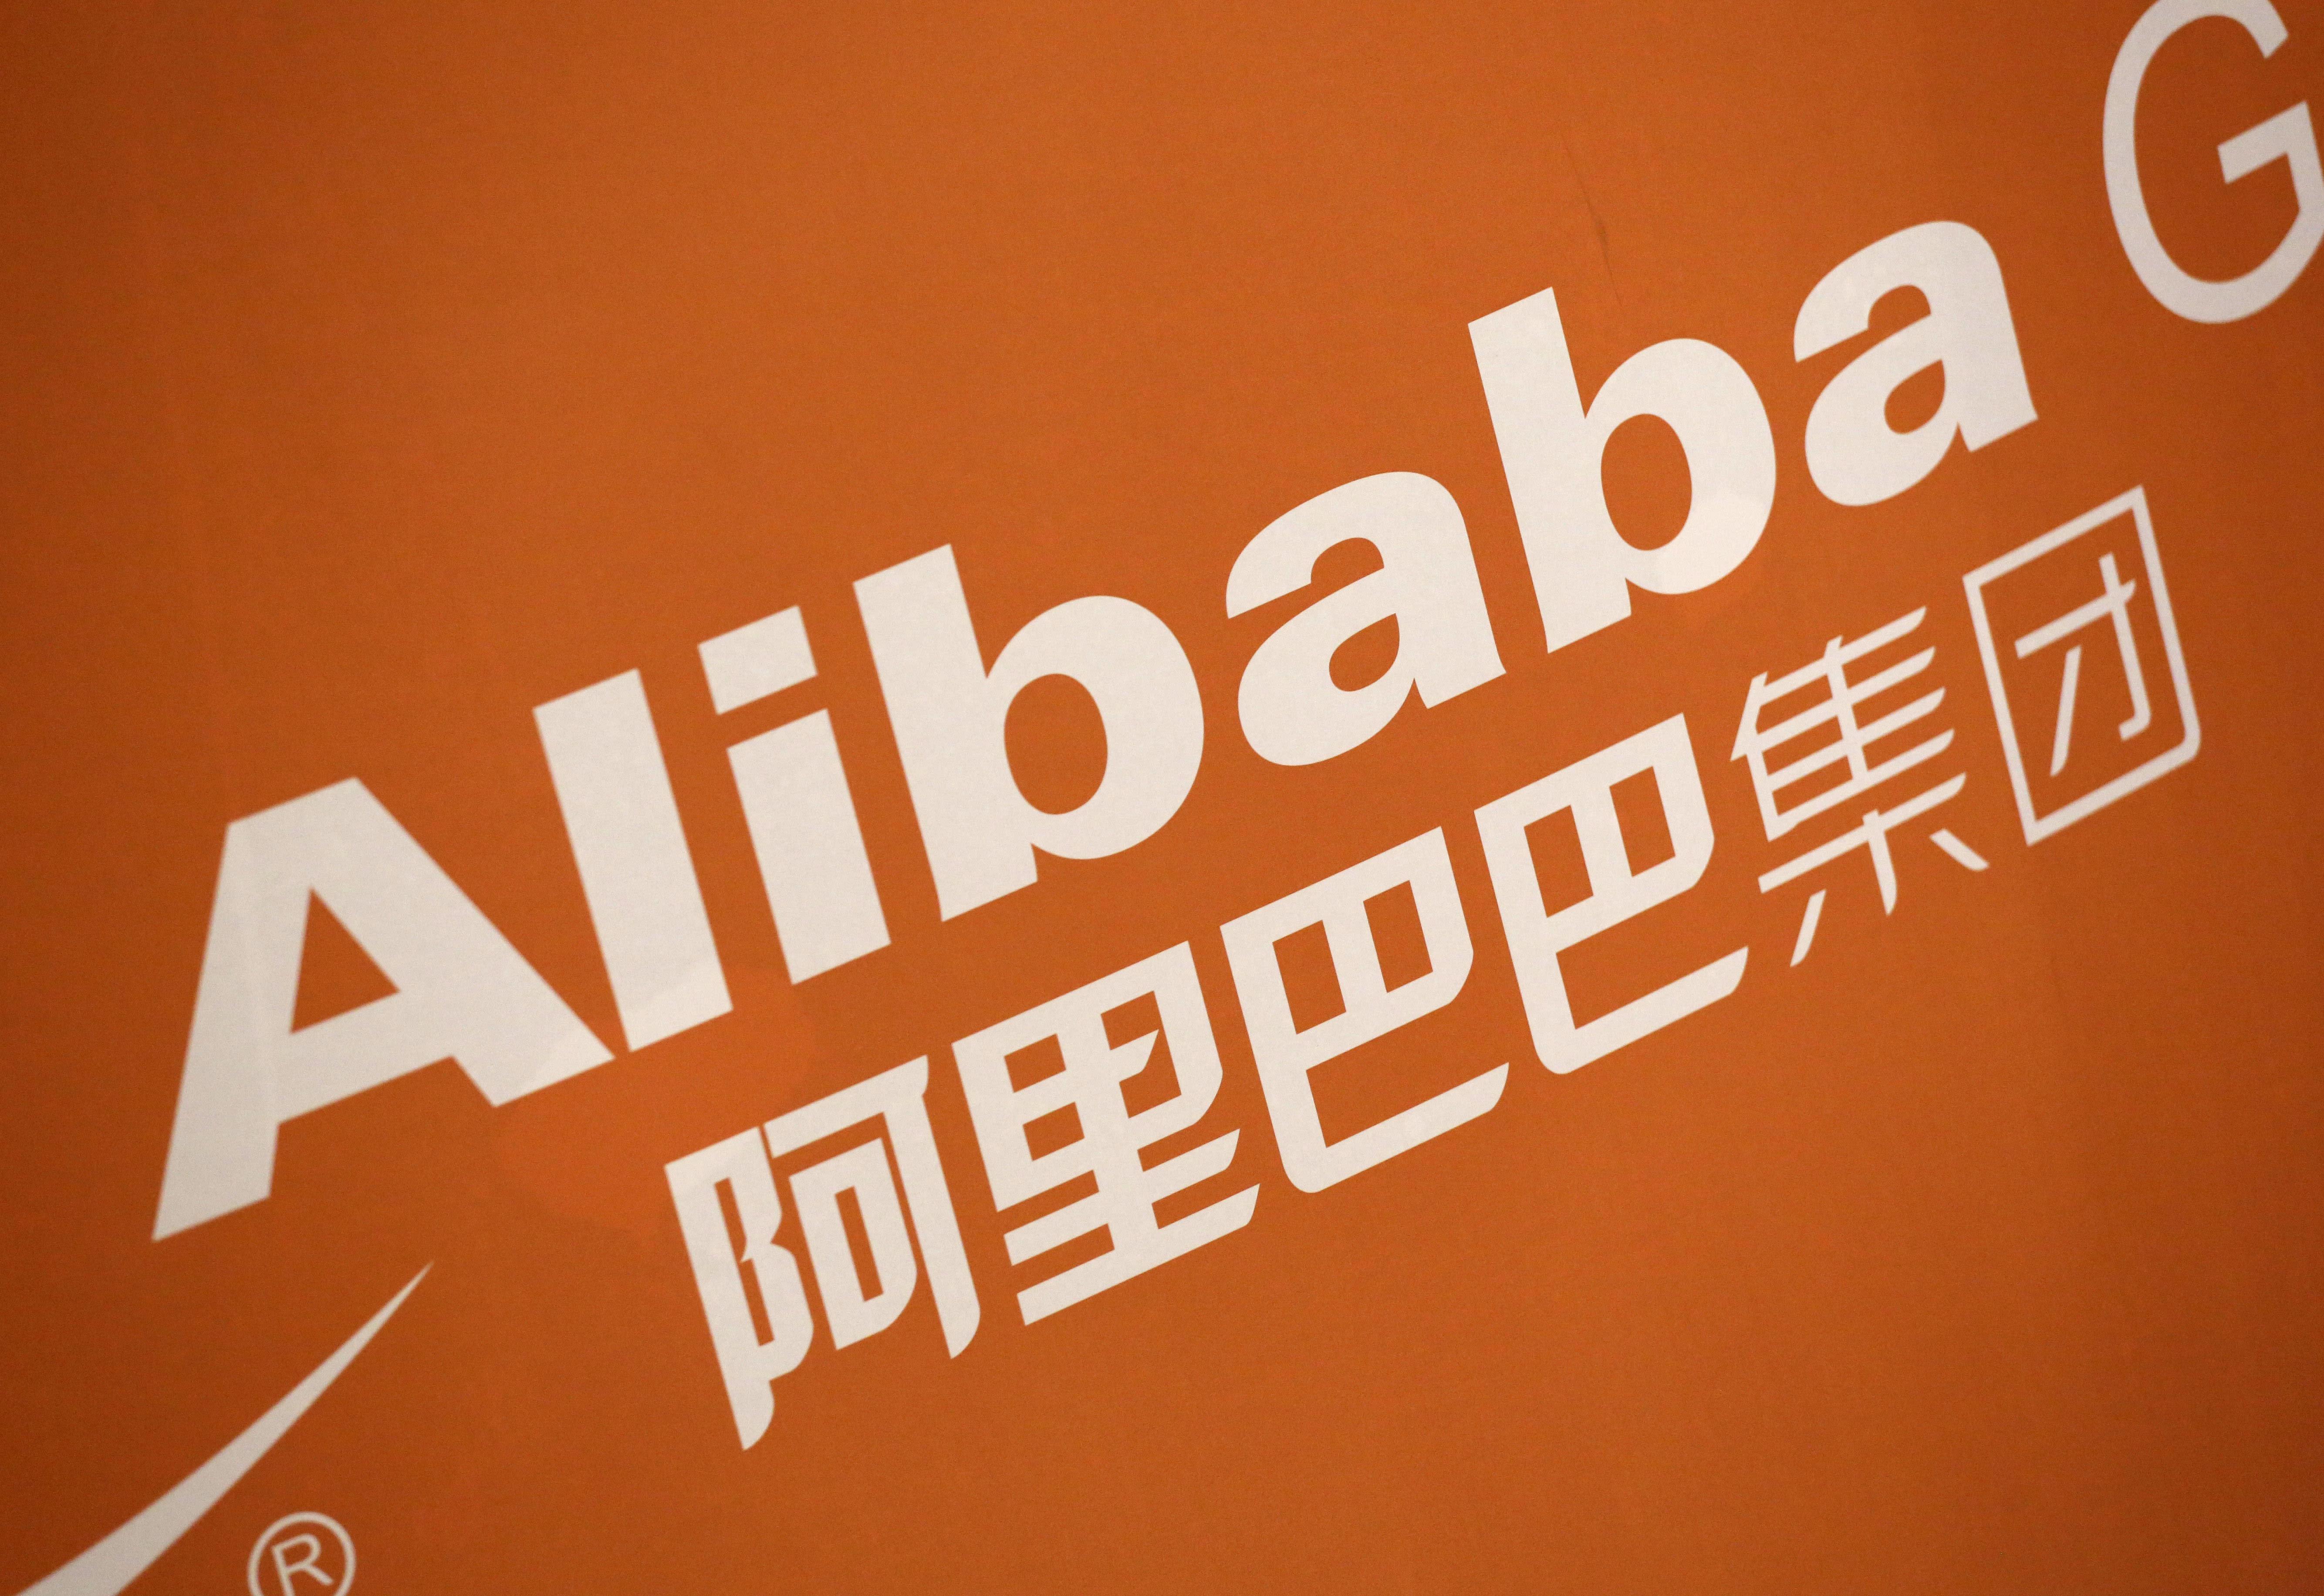 Alibaba adjusted profit tops estimates, revenue disappoints